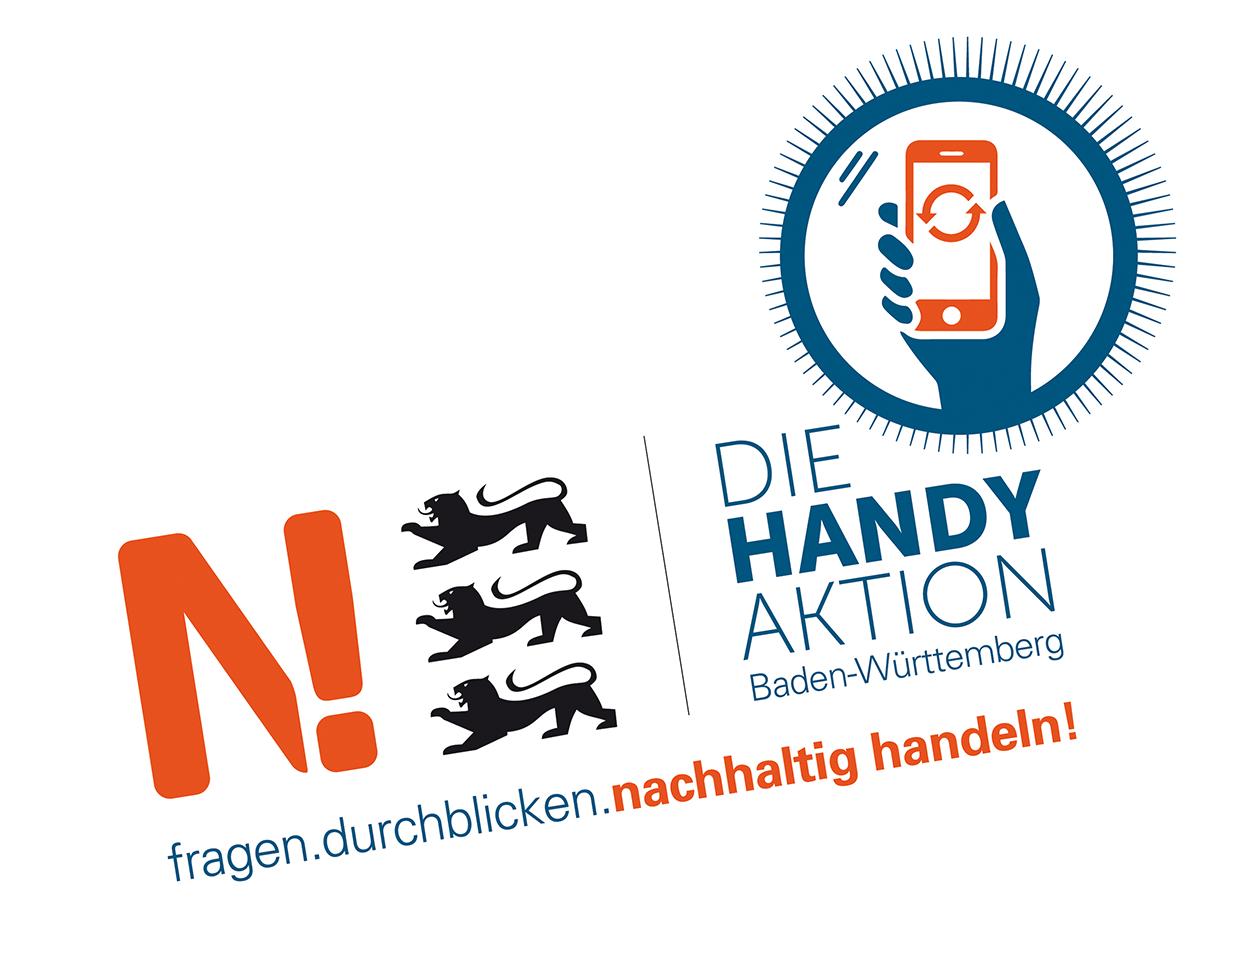 Handy-Aktion